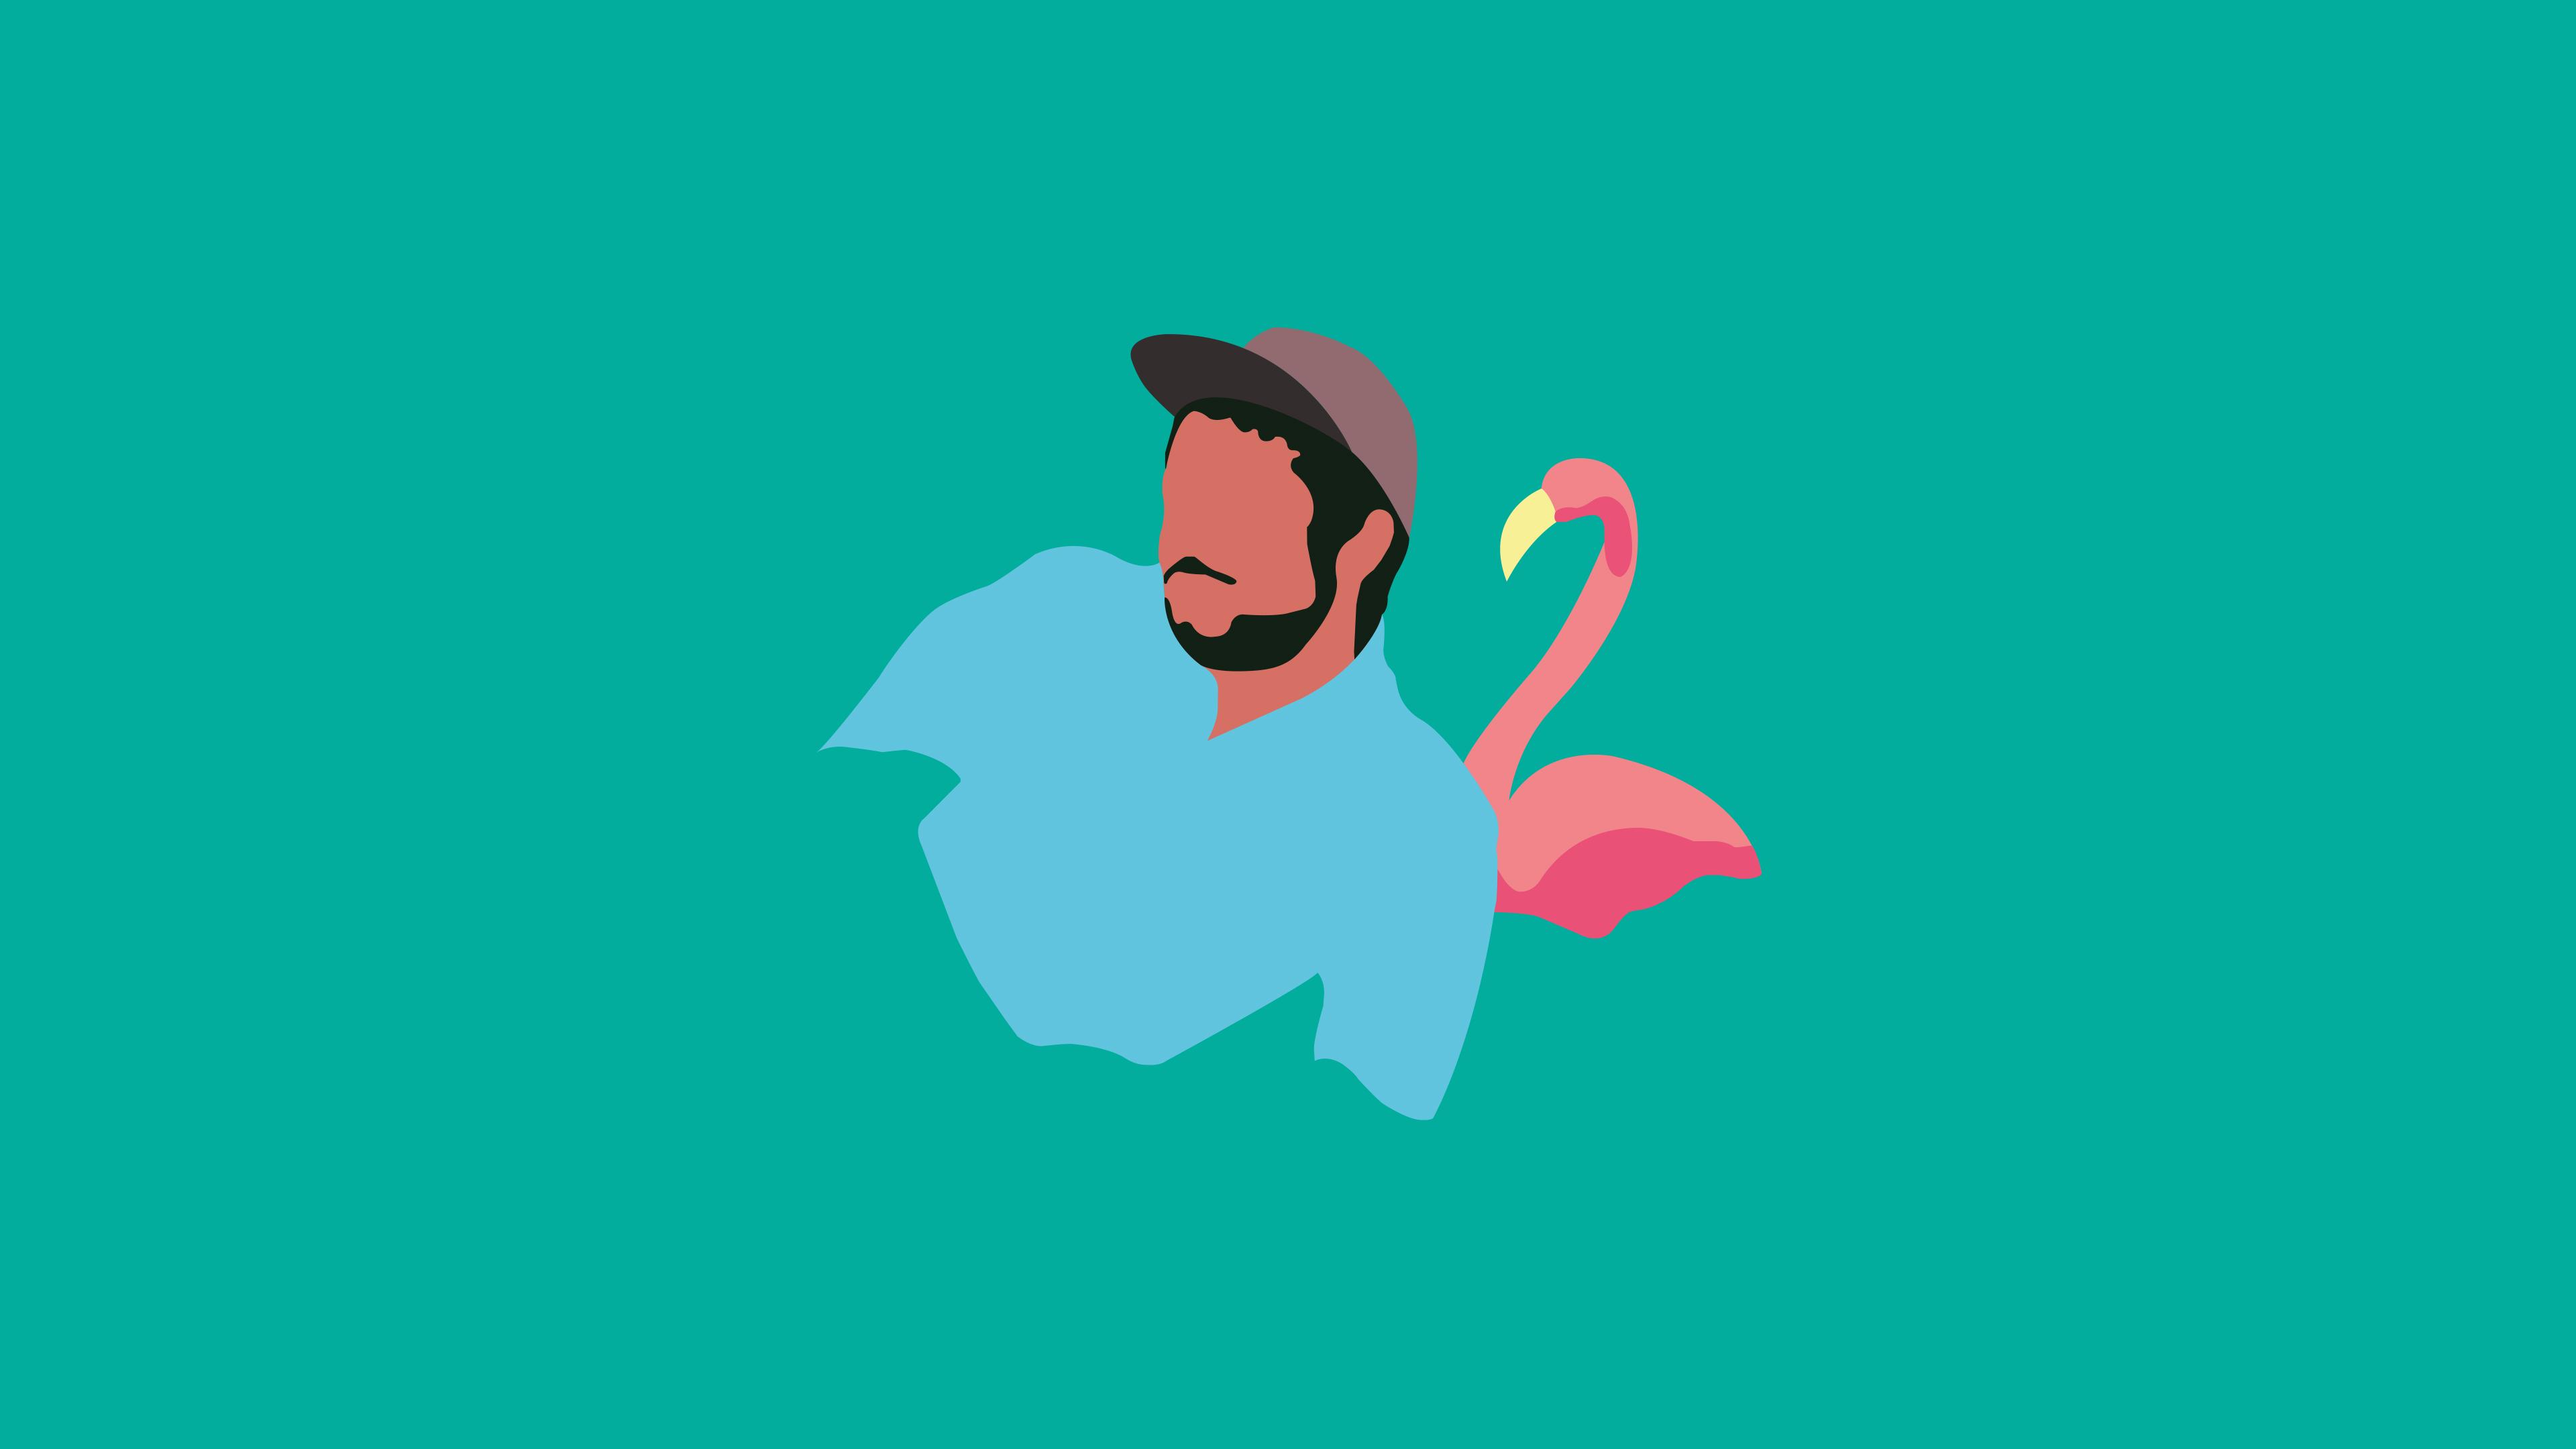 Wallpaper Flamingosis Adobe Illustrator Designer